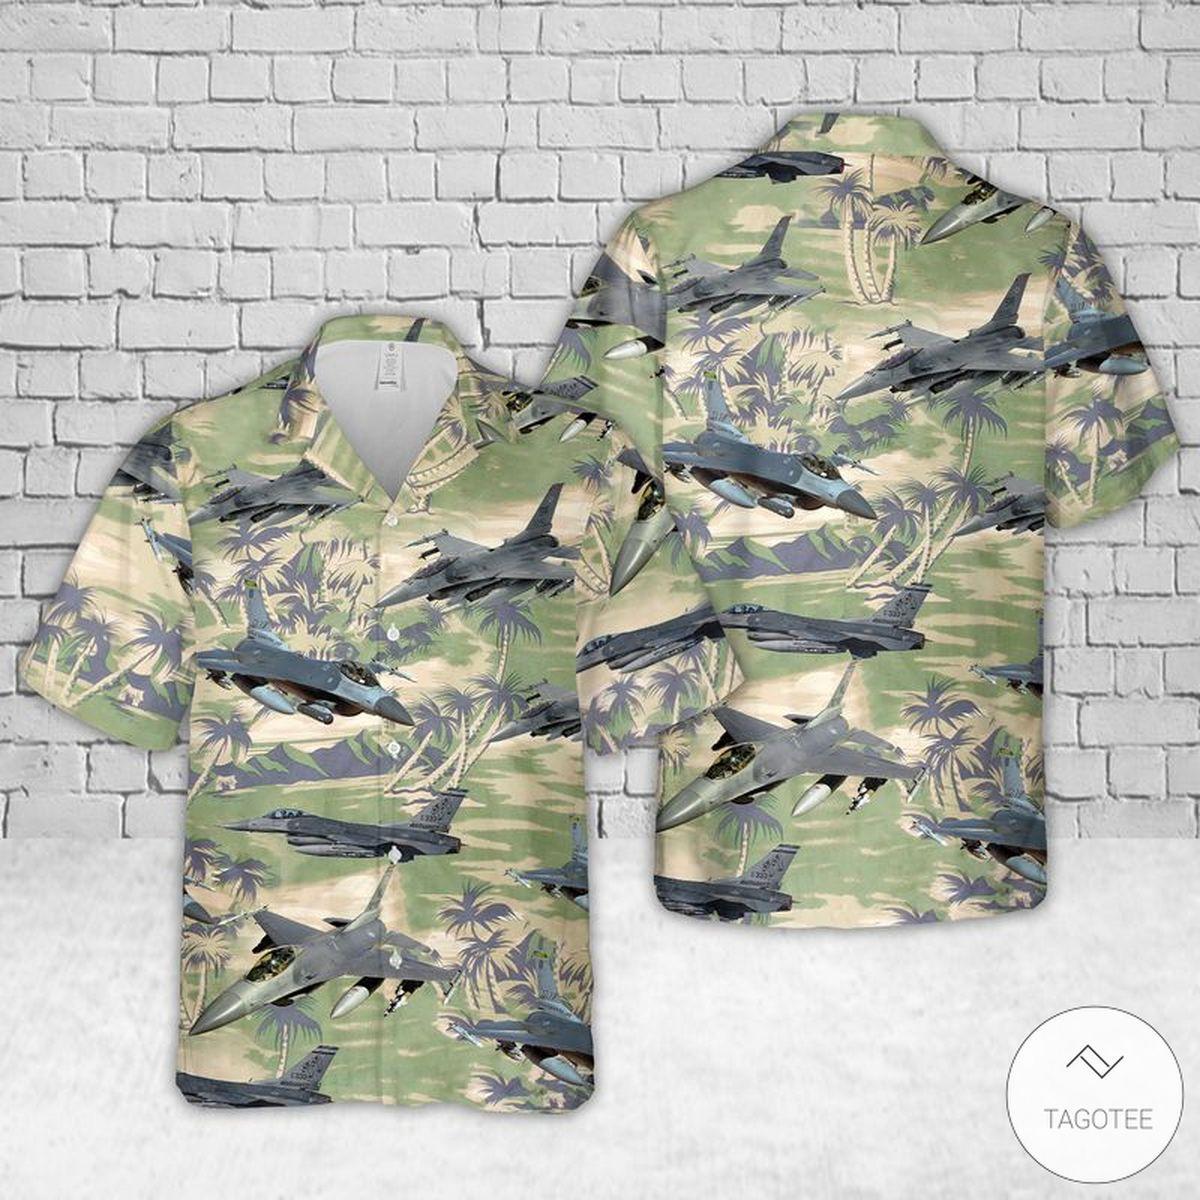 Air Force General Dynamics F-16 Fighting Falcon Hawaiian Shirt, Beach Shorts